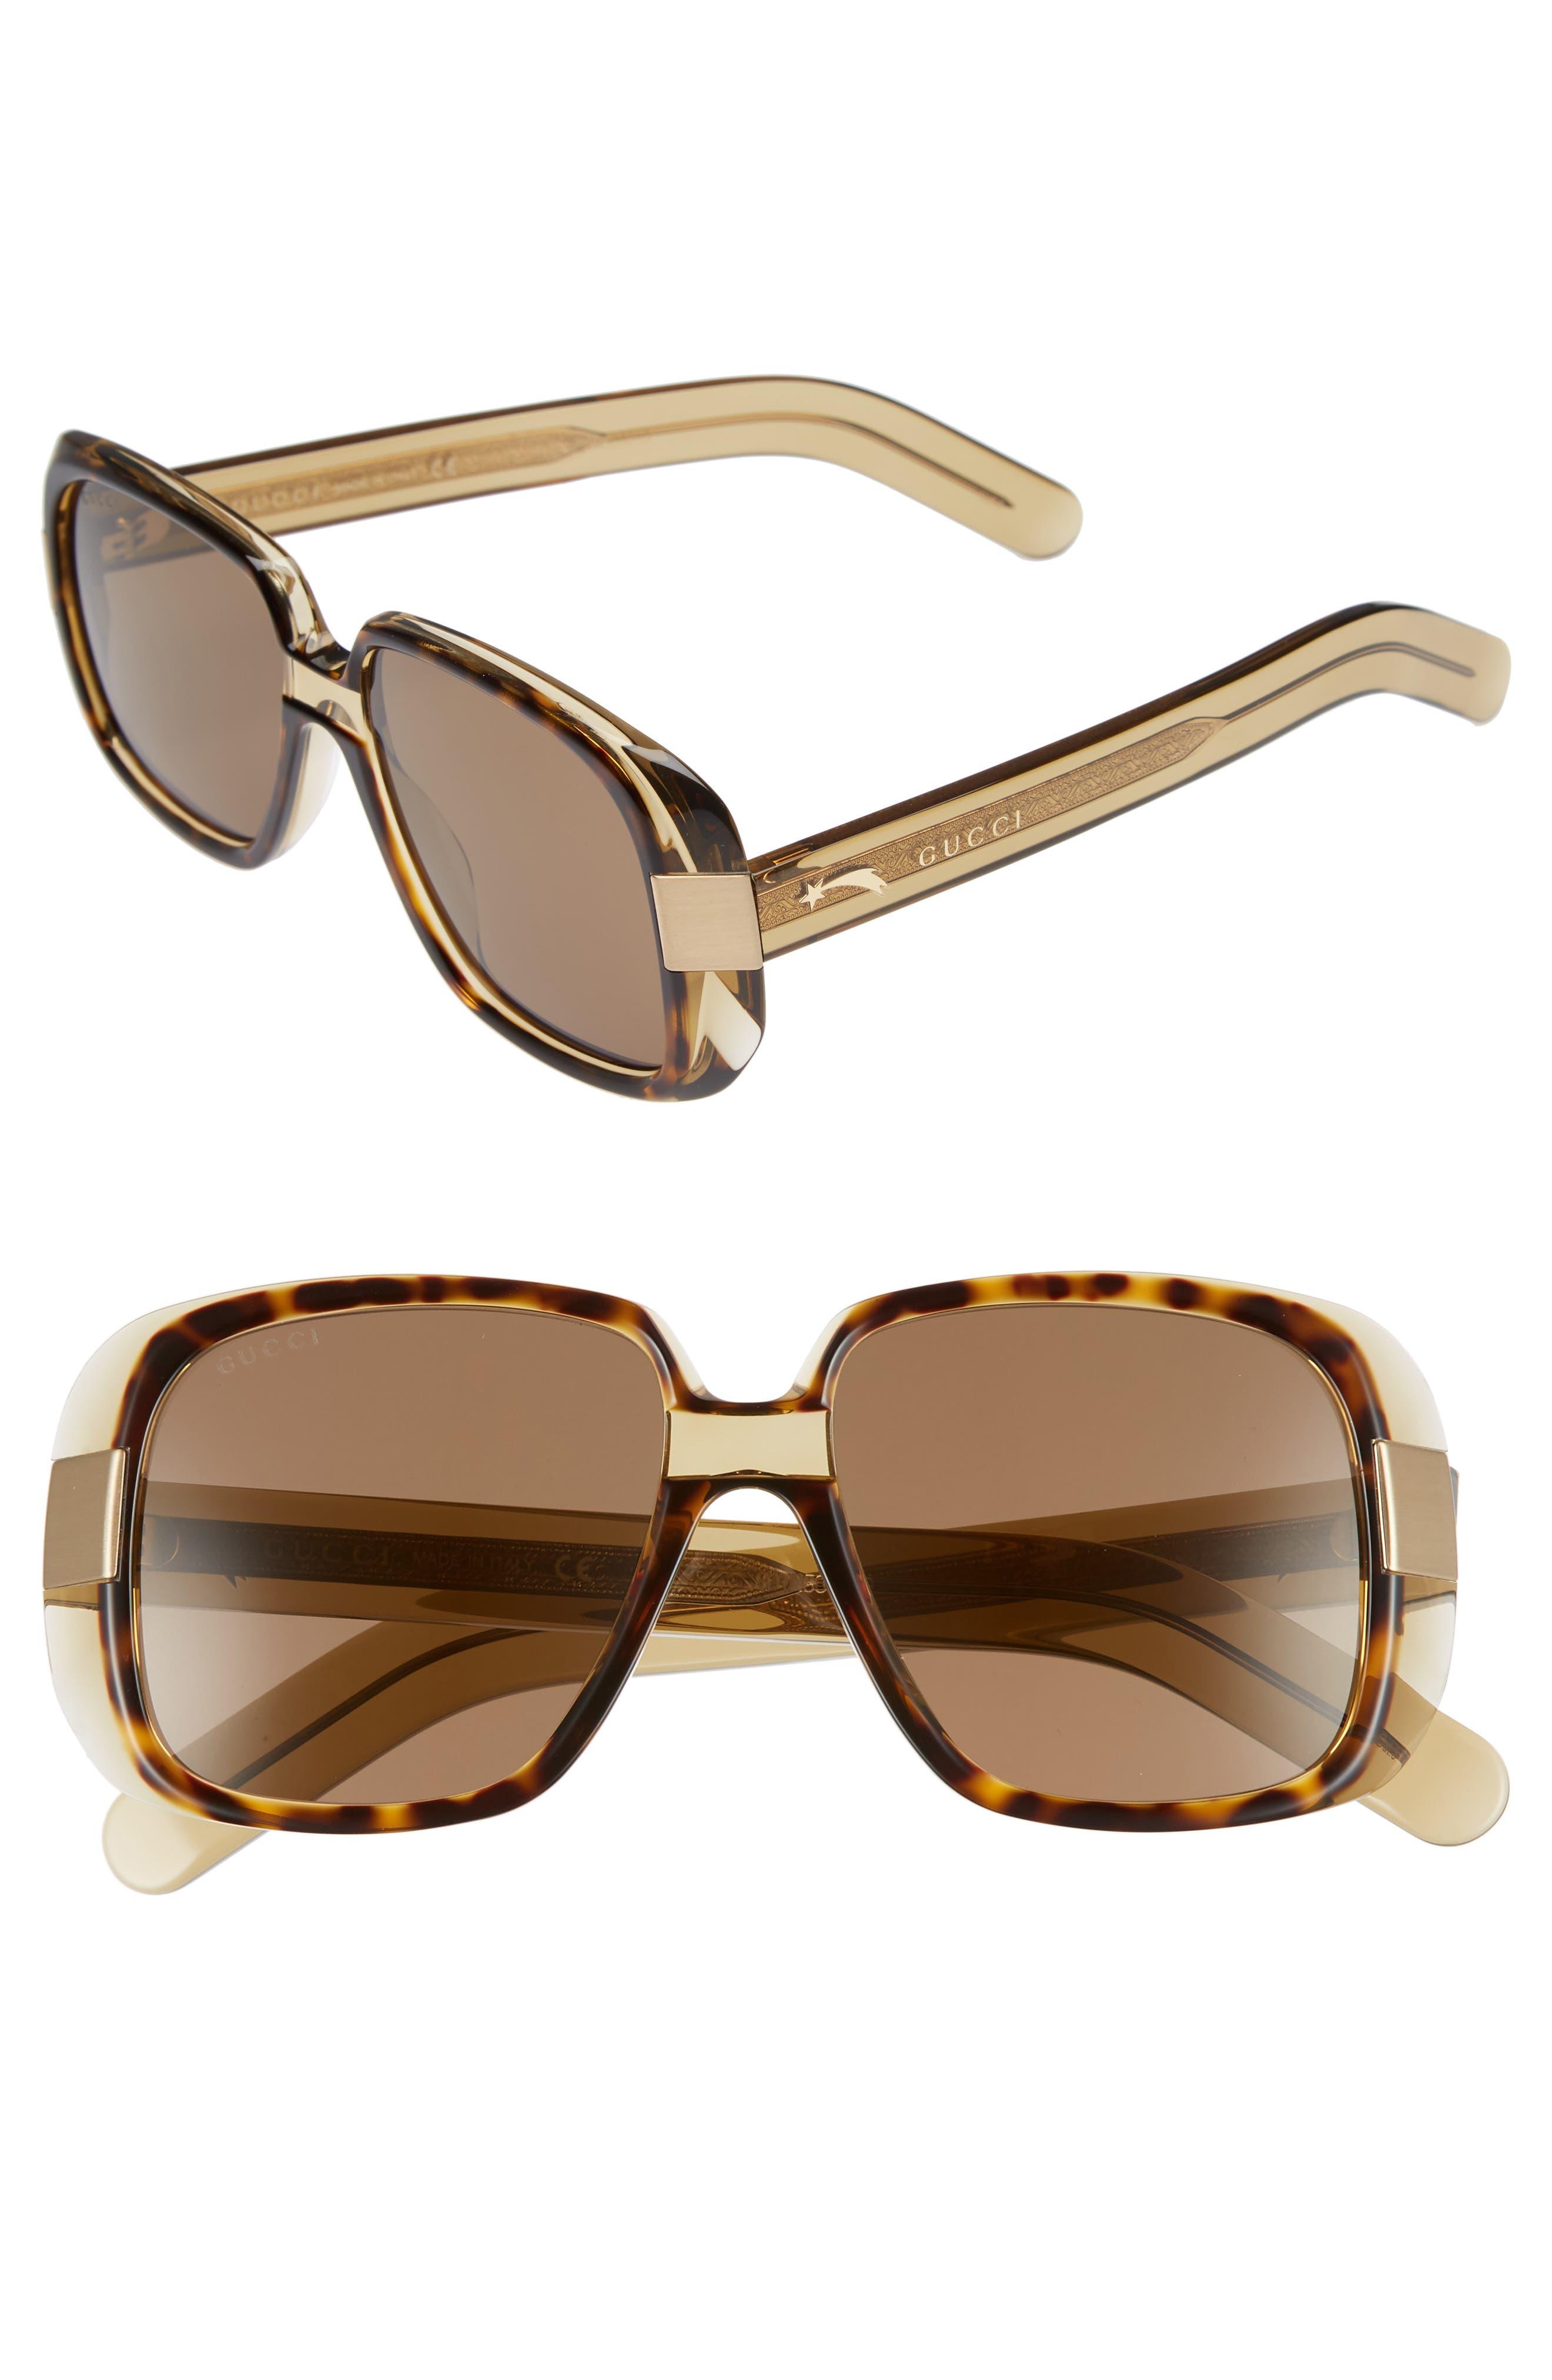 Cruise 51mm Square Sunglasses,                         Main,                         color, Olive